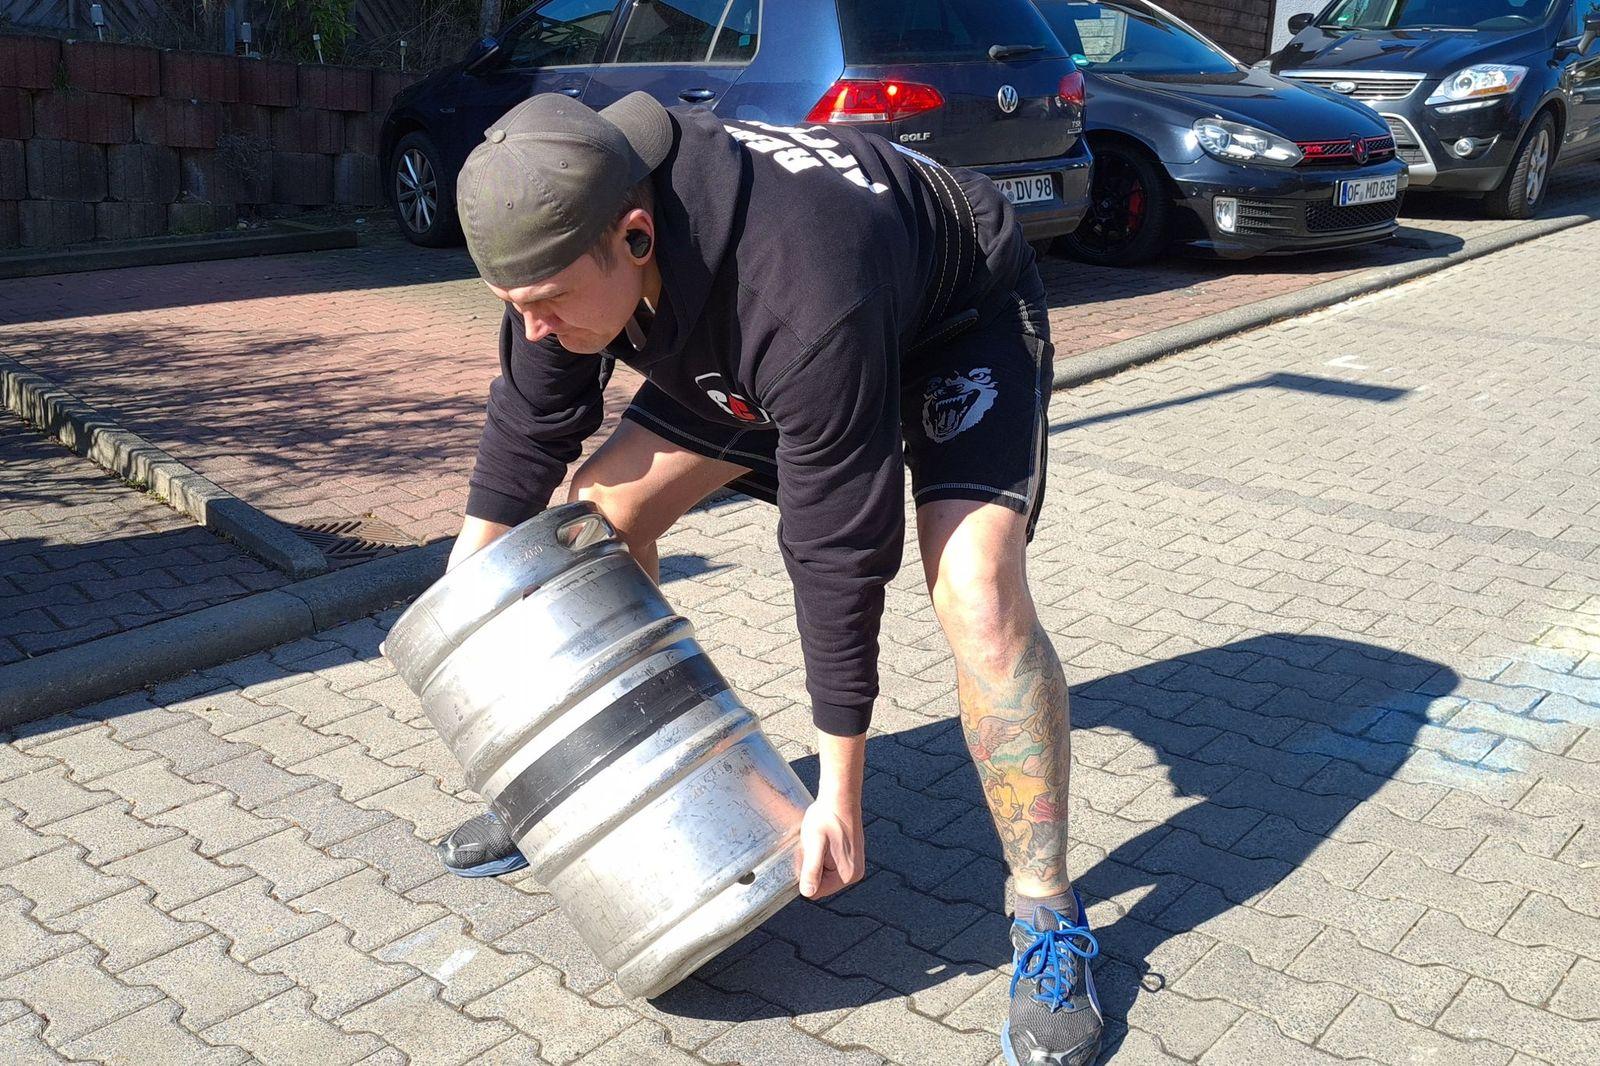 Combative Strongman | Keg Lifting für Combatives, Krav Maga, Kampfsport und Selbstverteidigung (Teil 2)